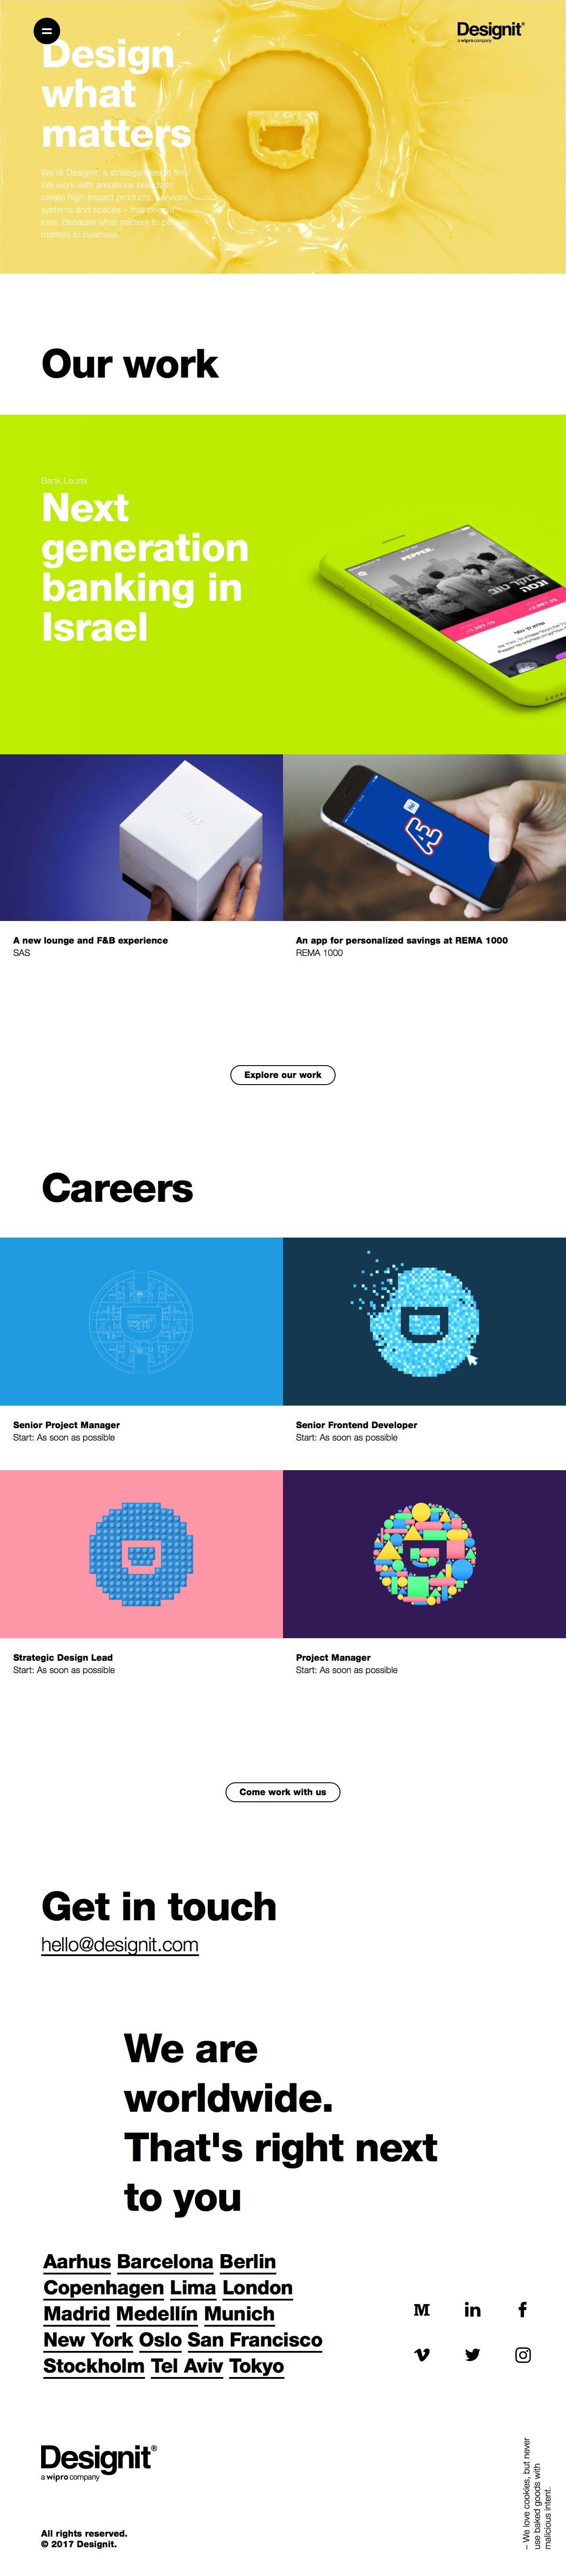 Designit - Design what matters | Lapa - Landing Pages Inspiration ...